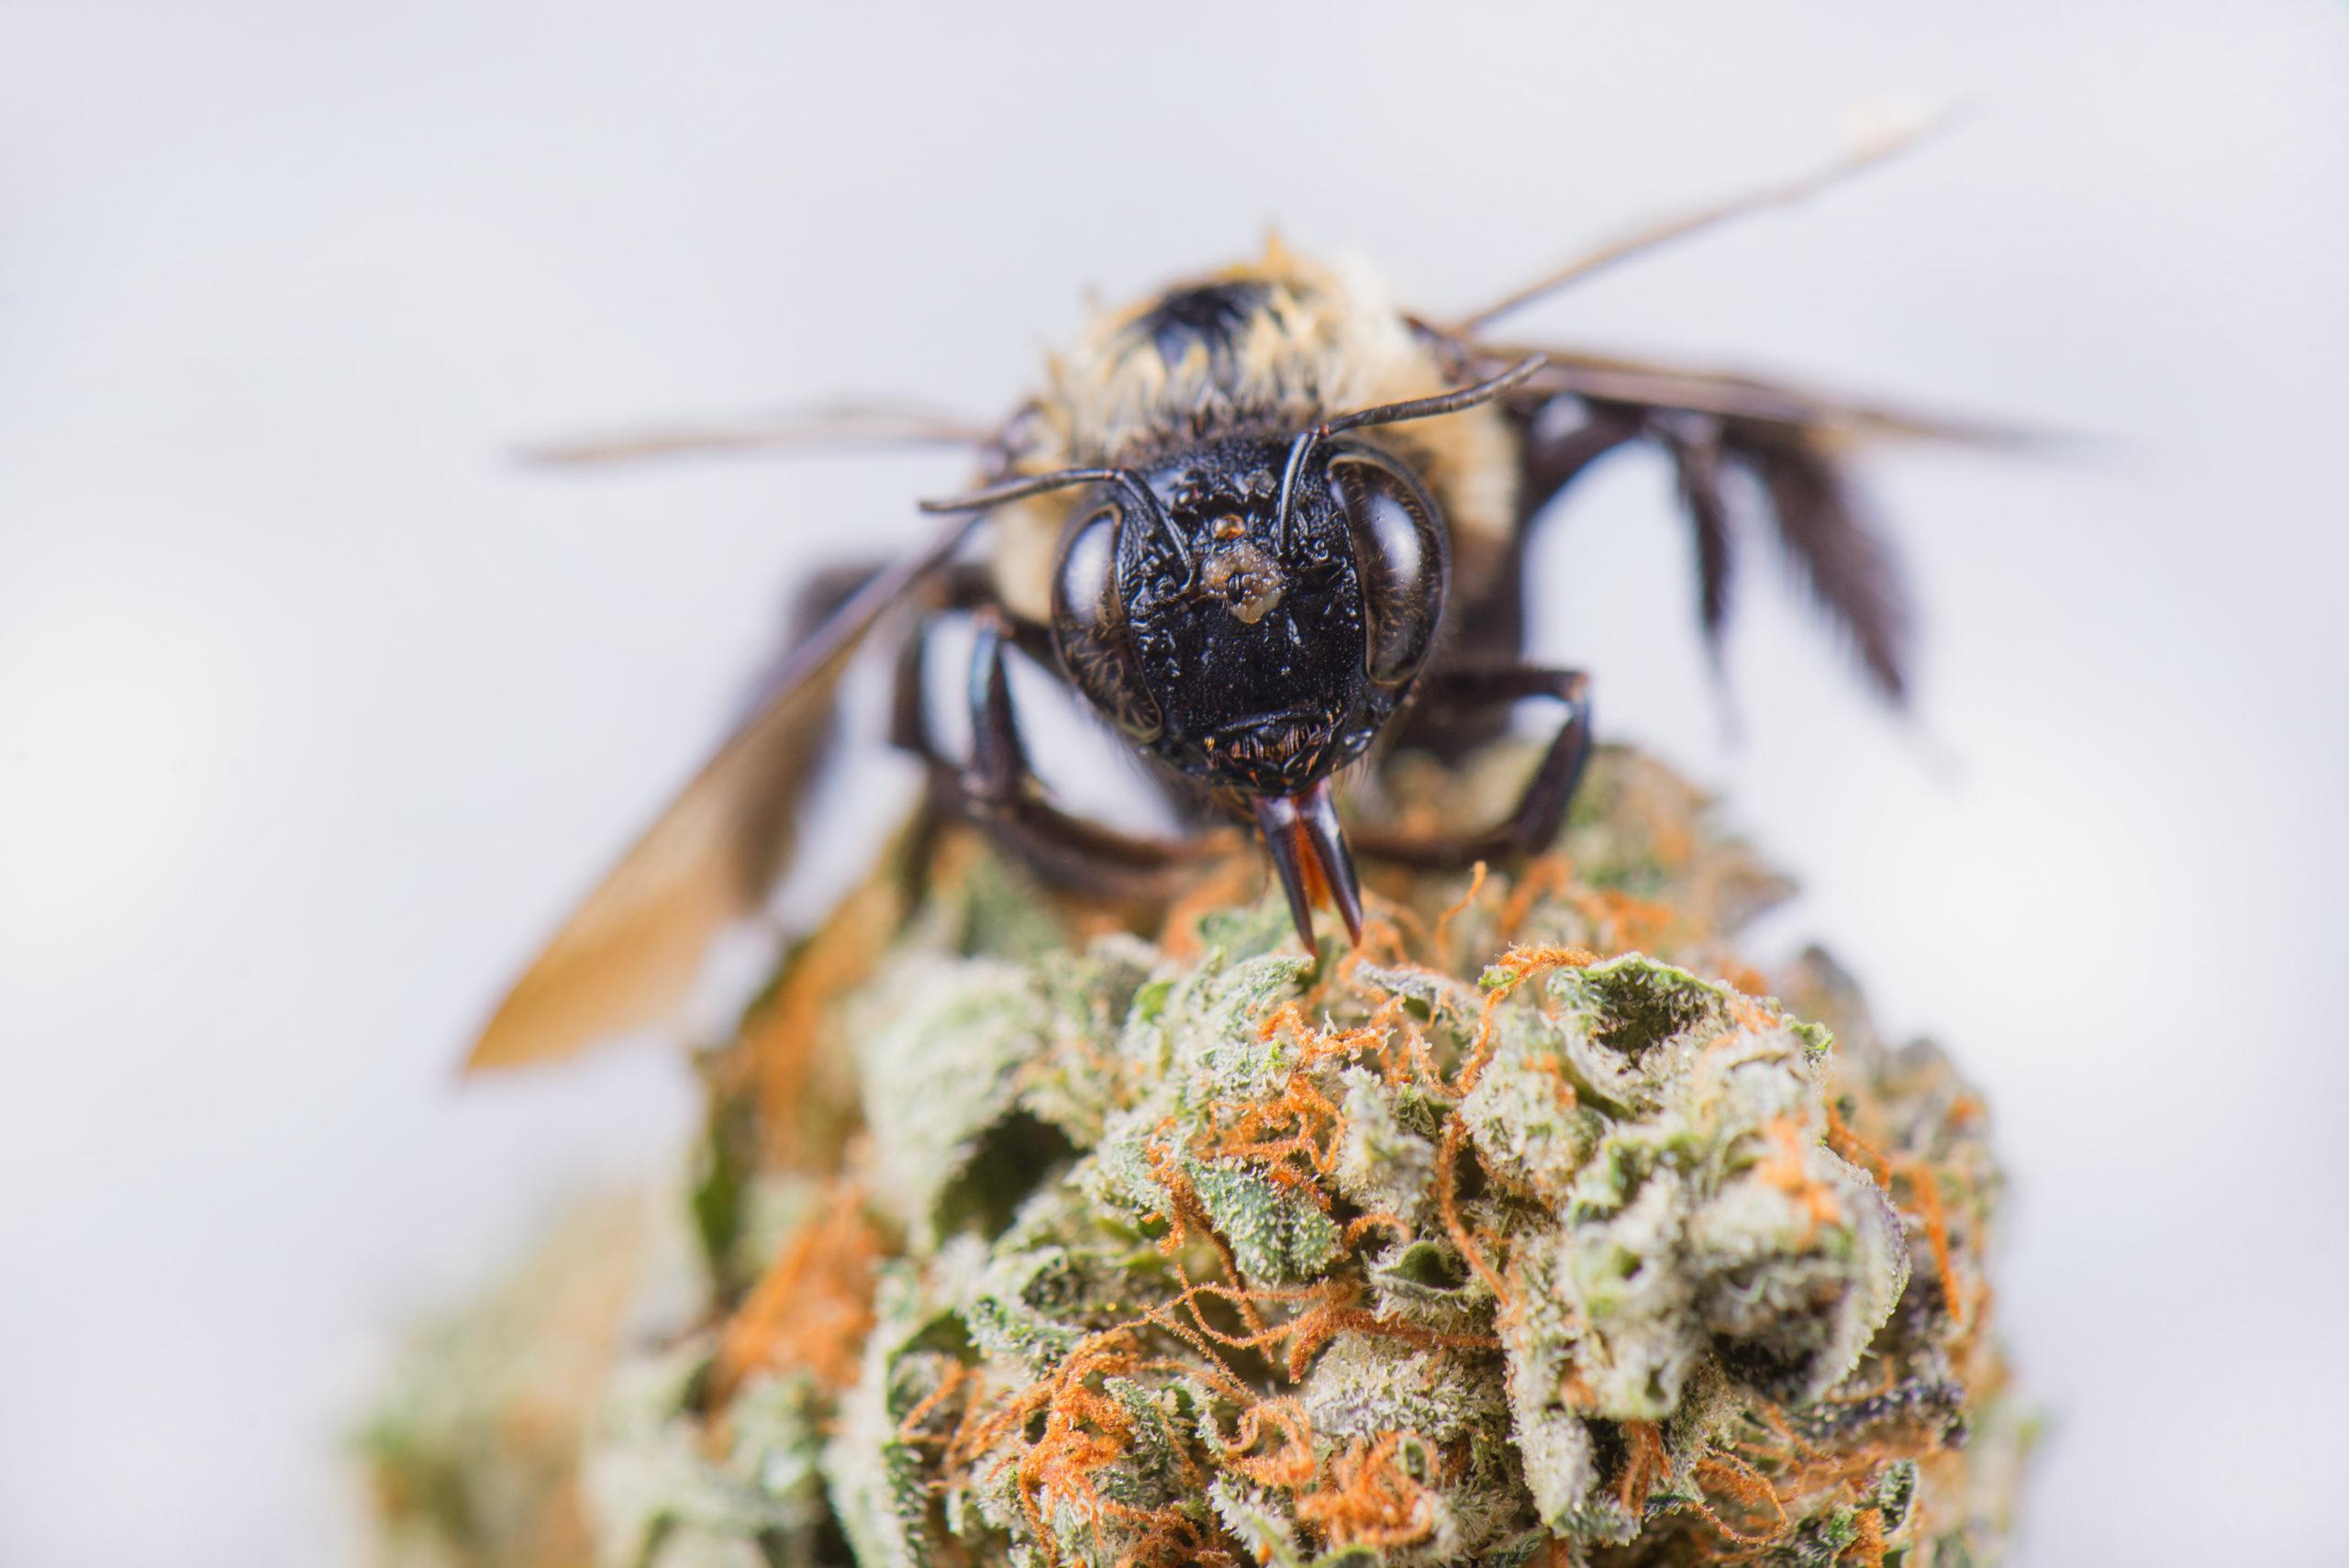 Expert Beekeeper Says Hemp Plants Can't Save Bees, But Pot Farmers Can Still Help.